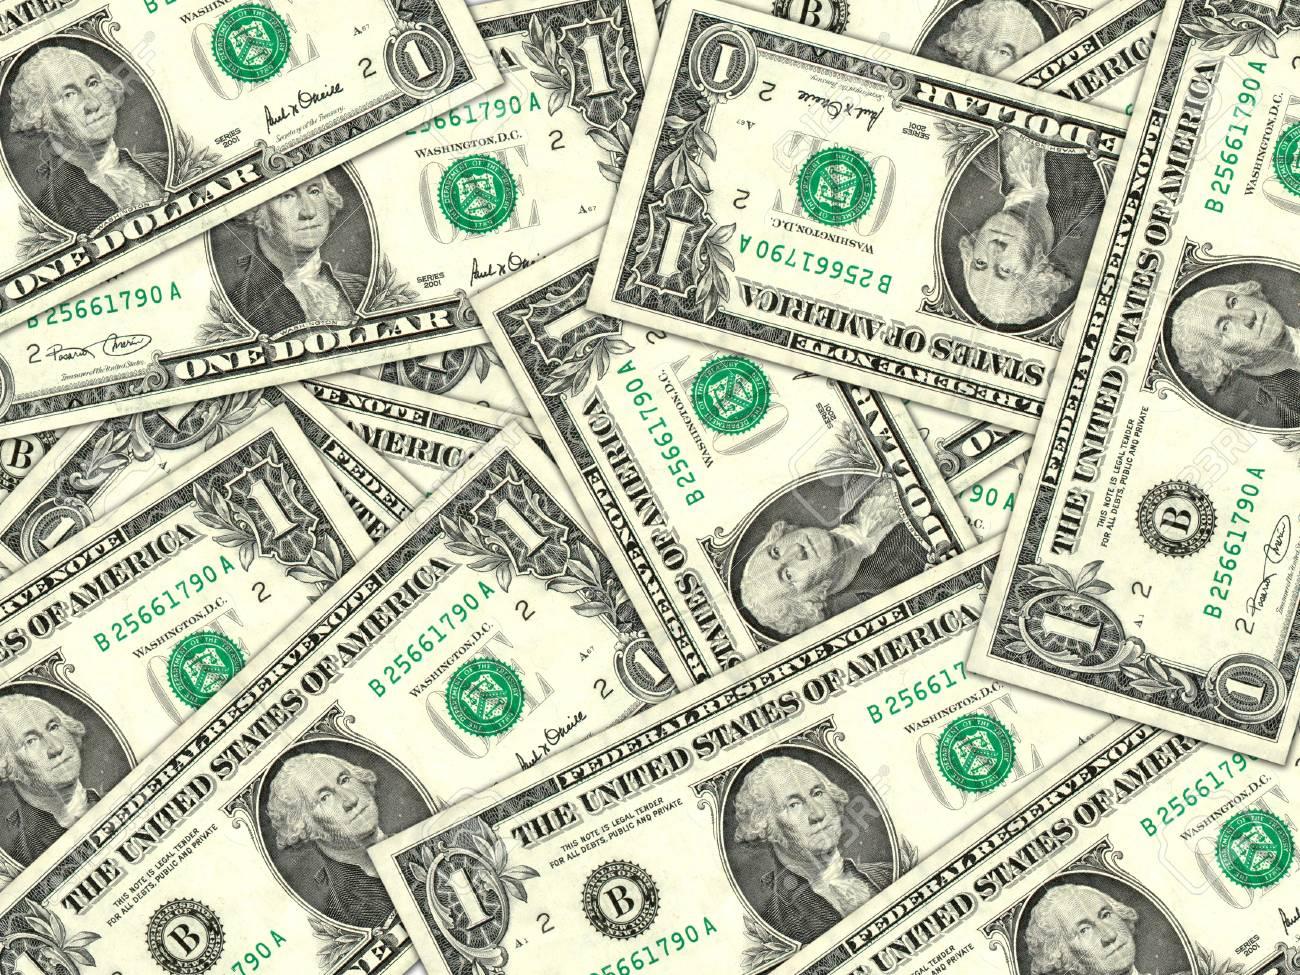 8x12 FT Money Vinyl Photography Background Backdrops,One Dollar Bill Buck Design American Federal Reserve Note Pattern Wealth Symbol Background Newborn Baby Portrait Photo Studio Photobooth Props